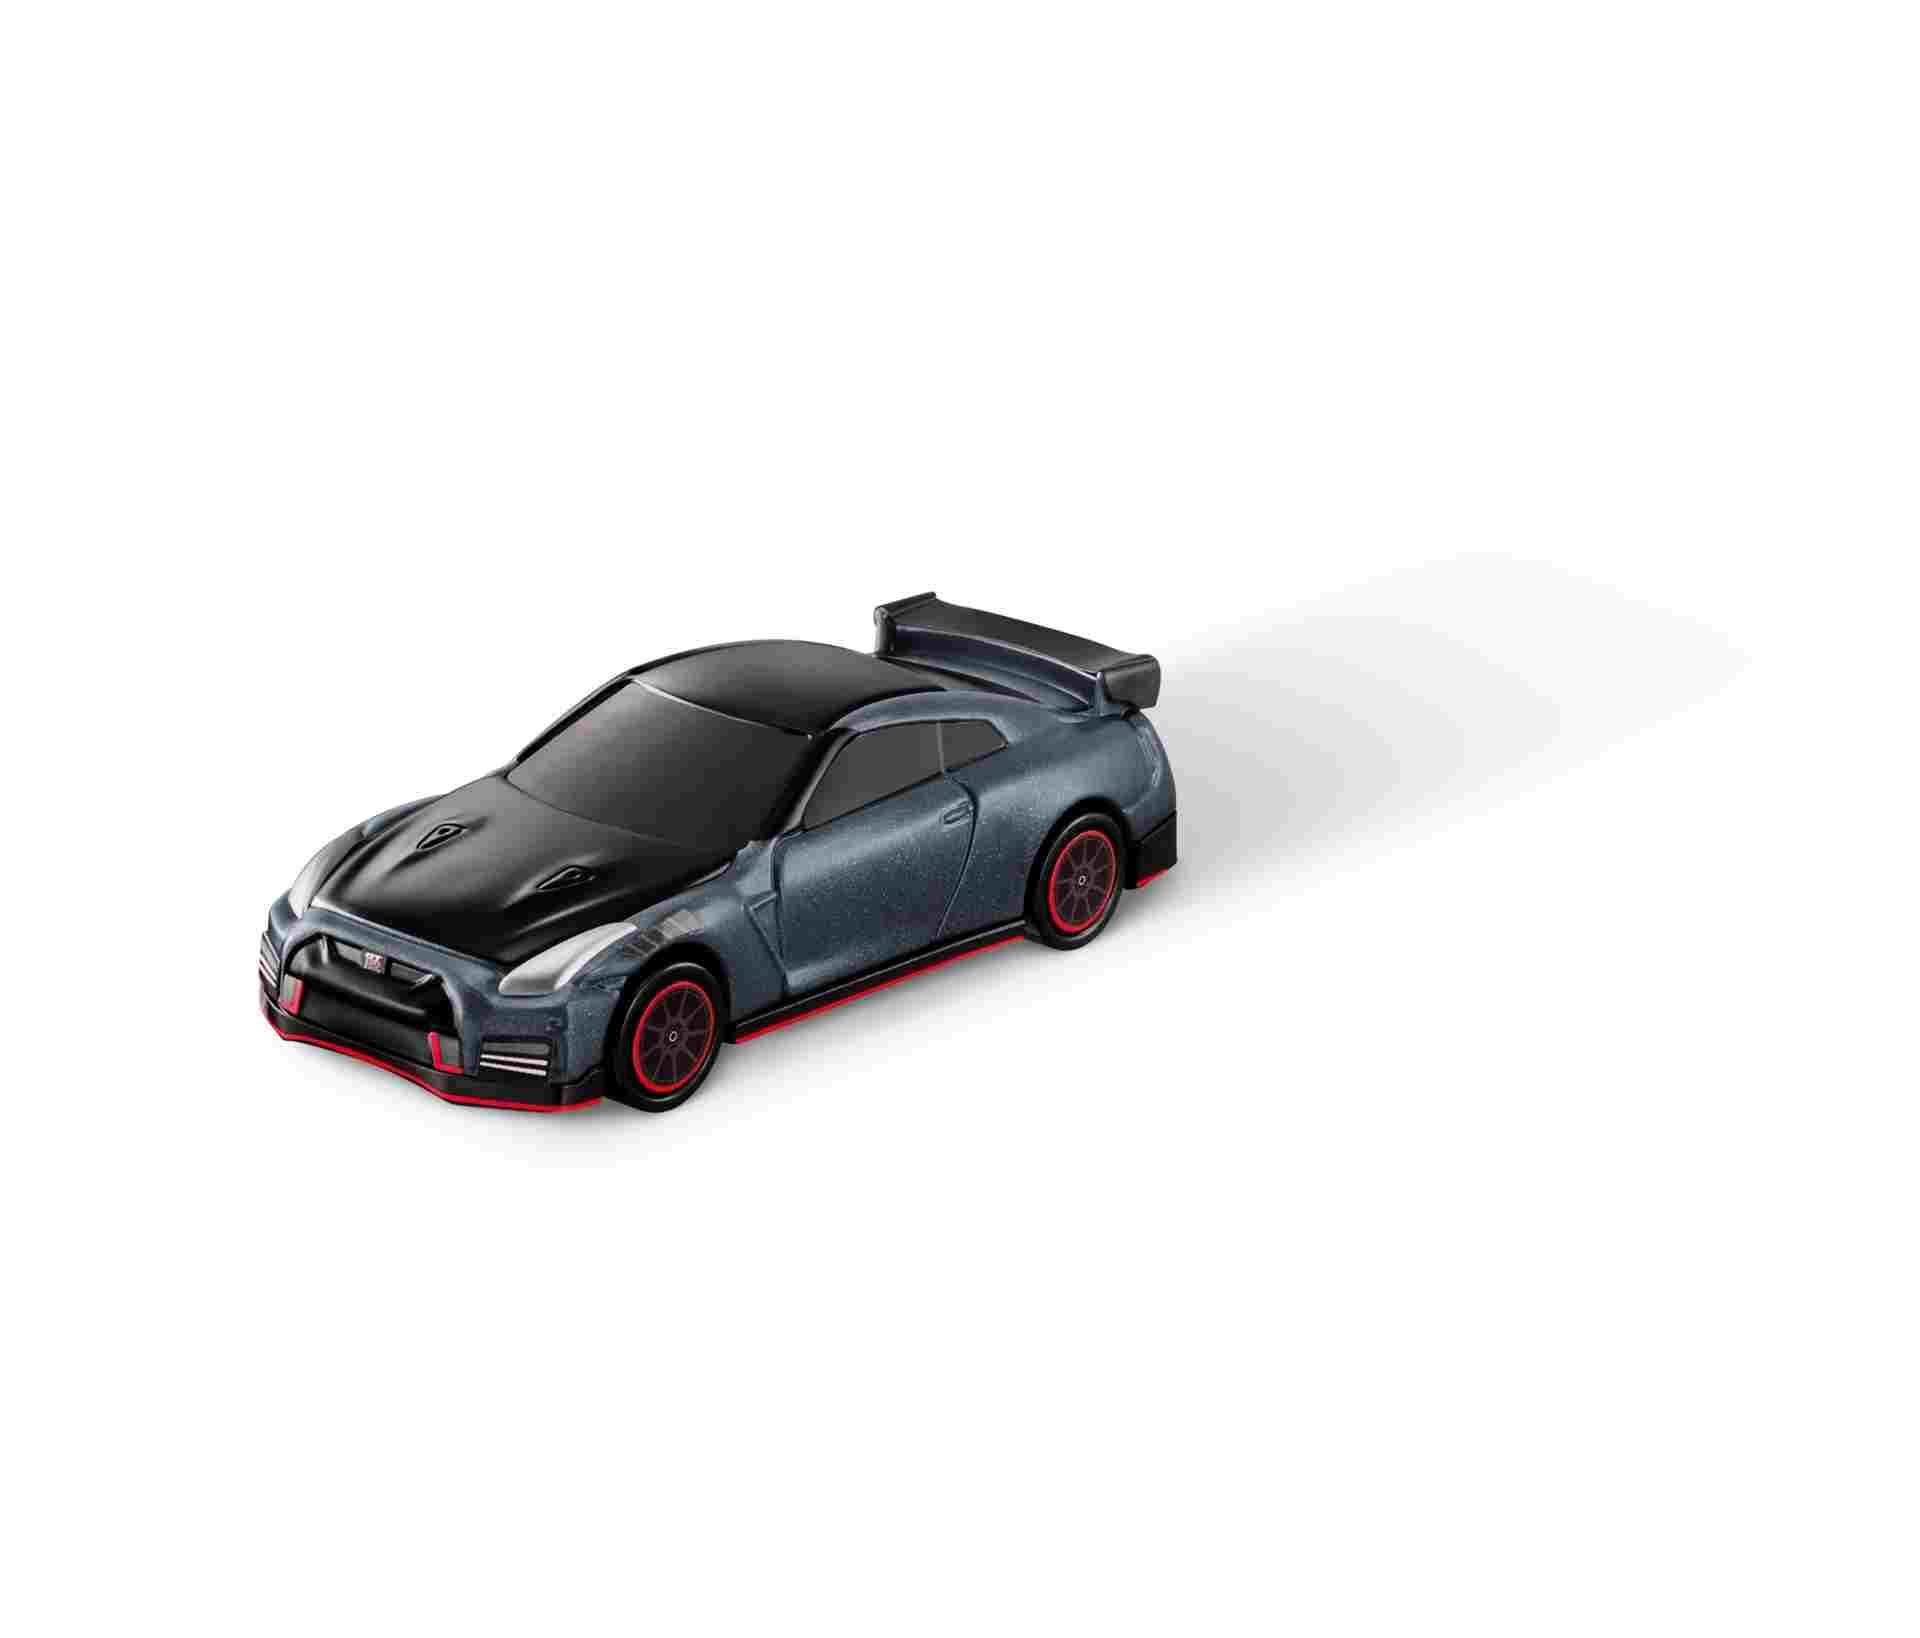 2021_Nissan_GT-R_Nismo-Special_Edition-0041